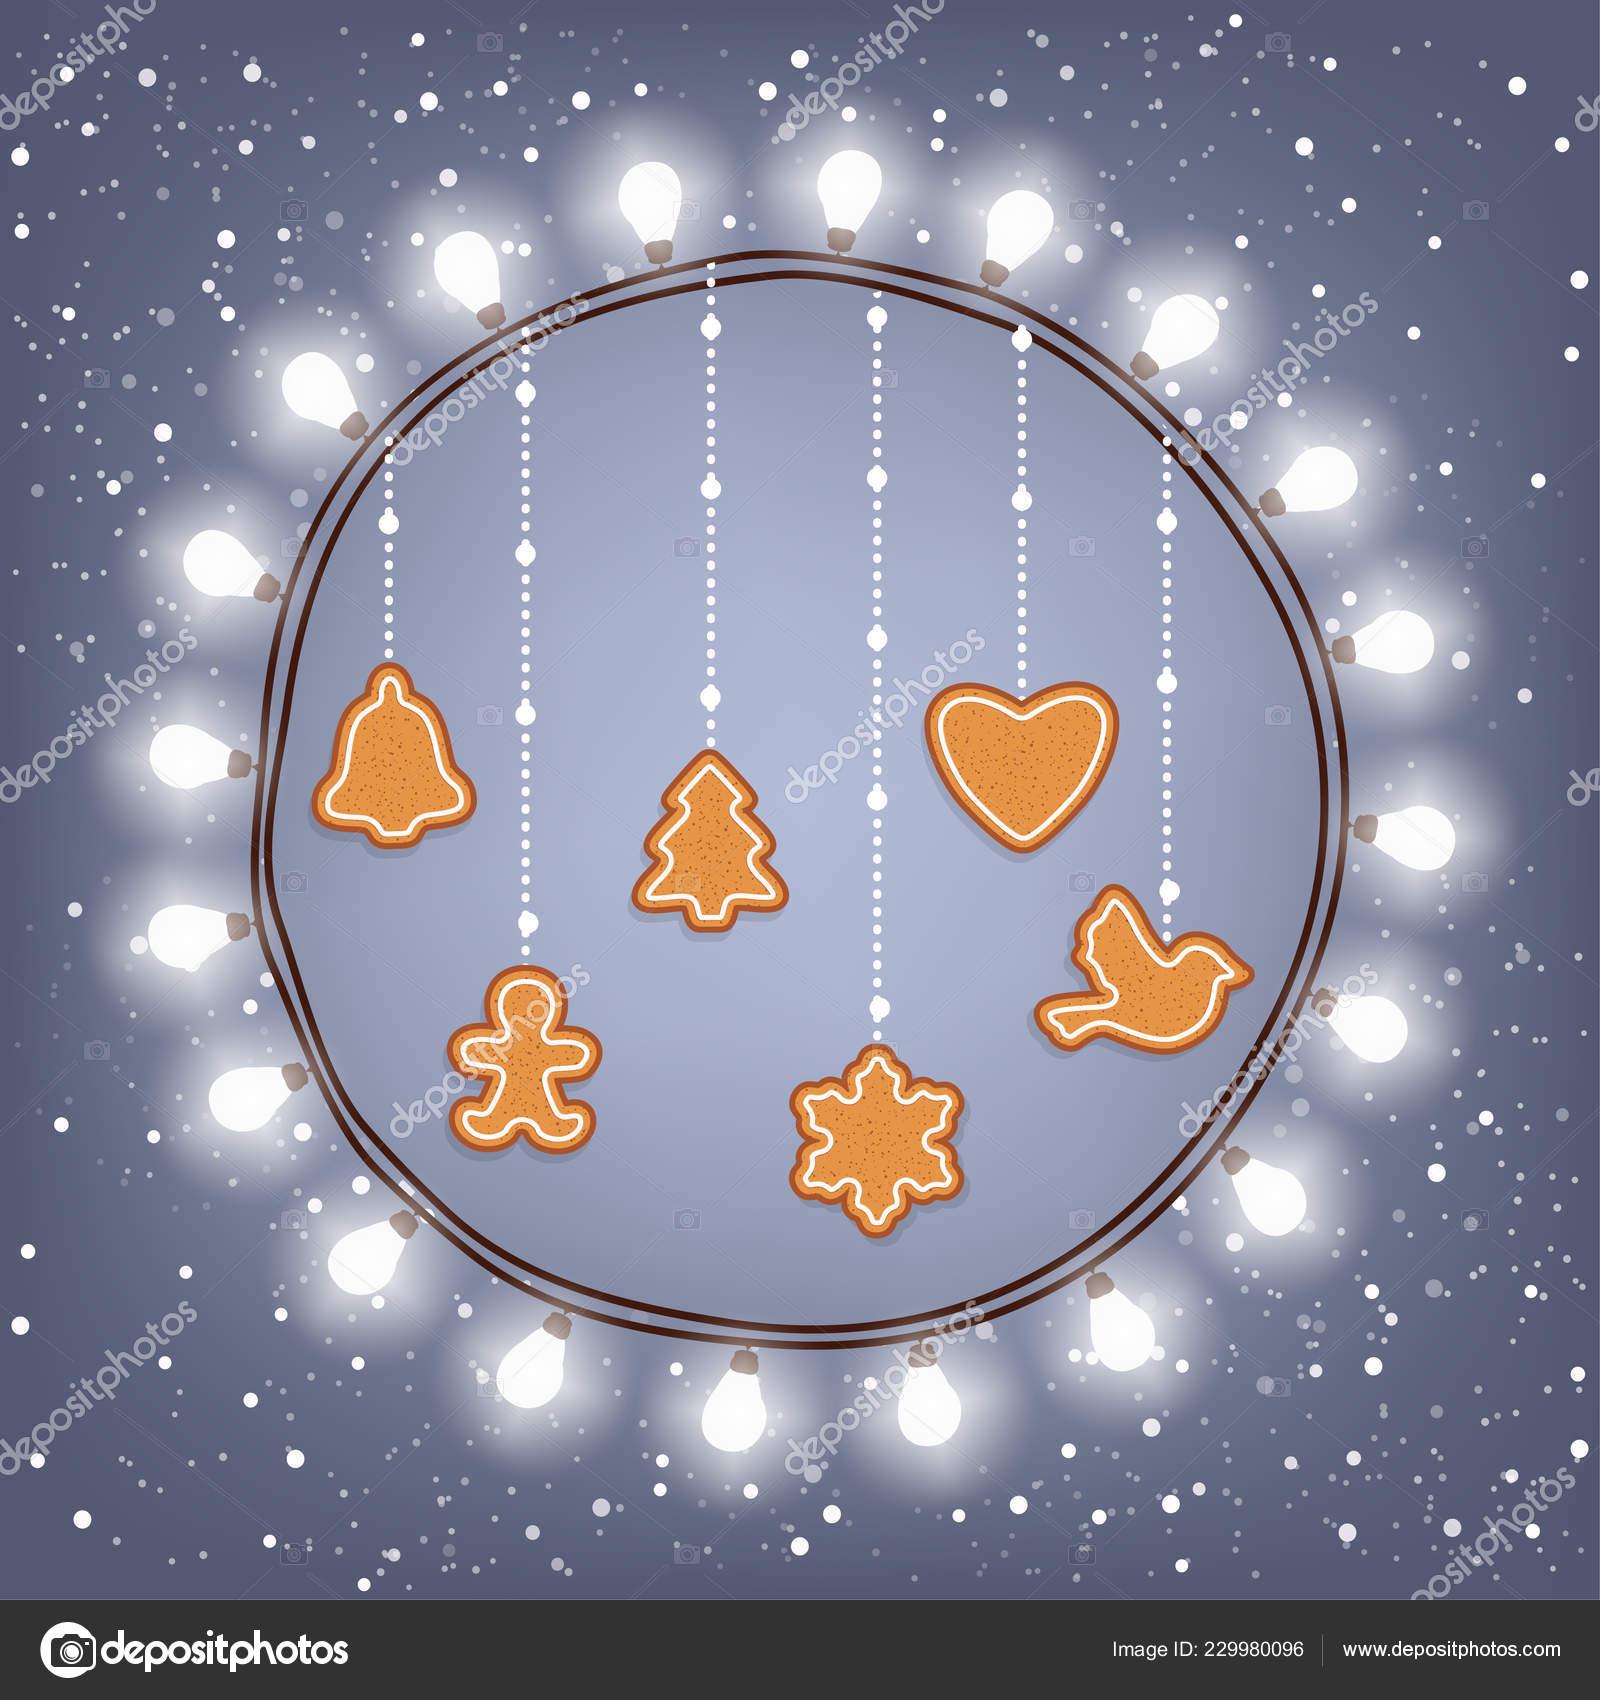 Christmas Card Bright Wreath Light Bulbs Ginger Cookies Snowy